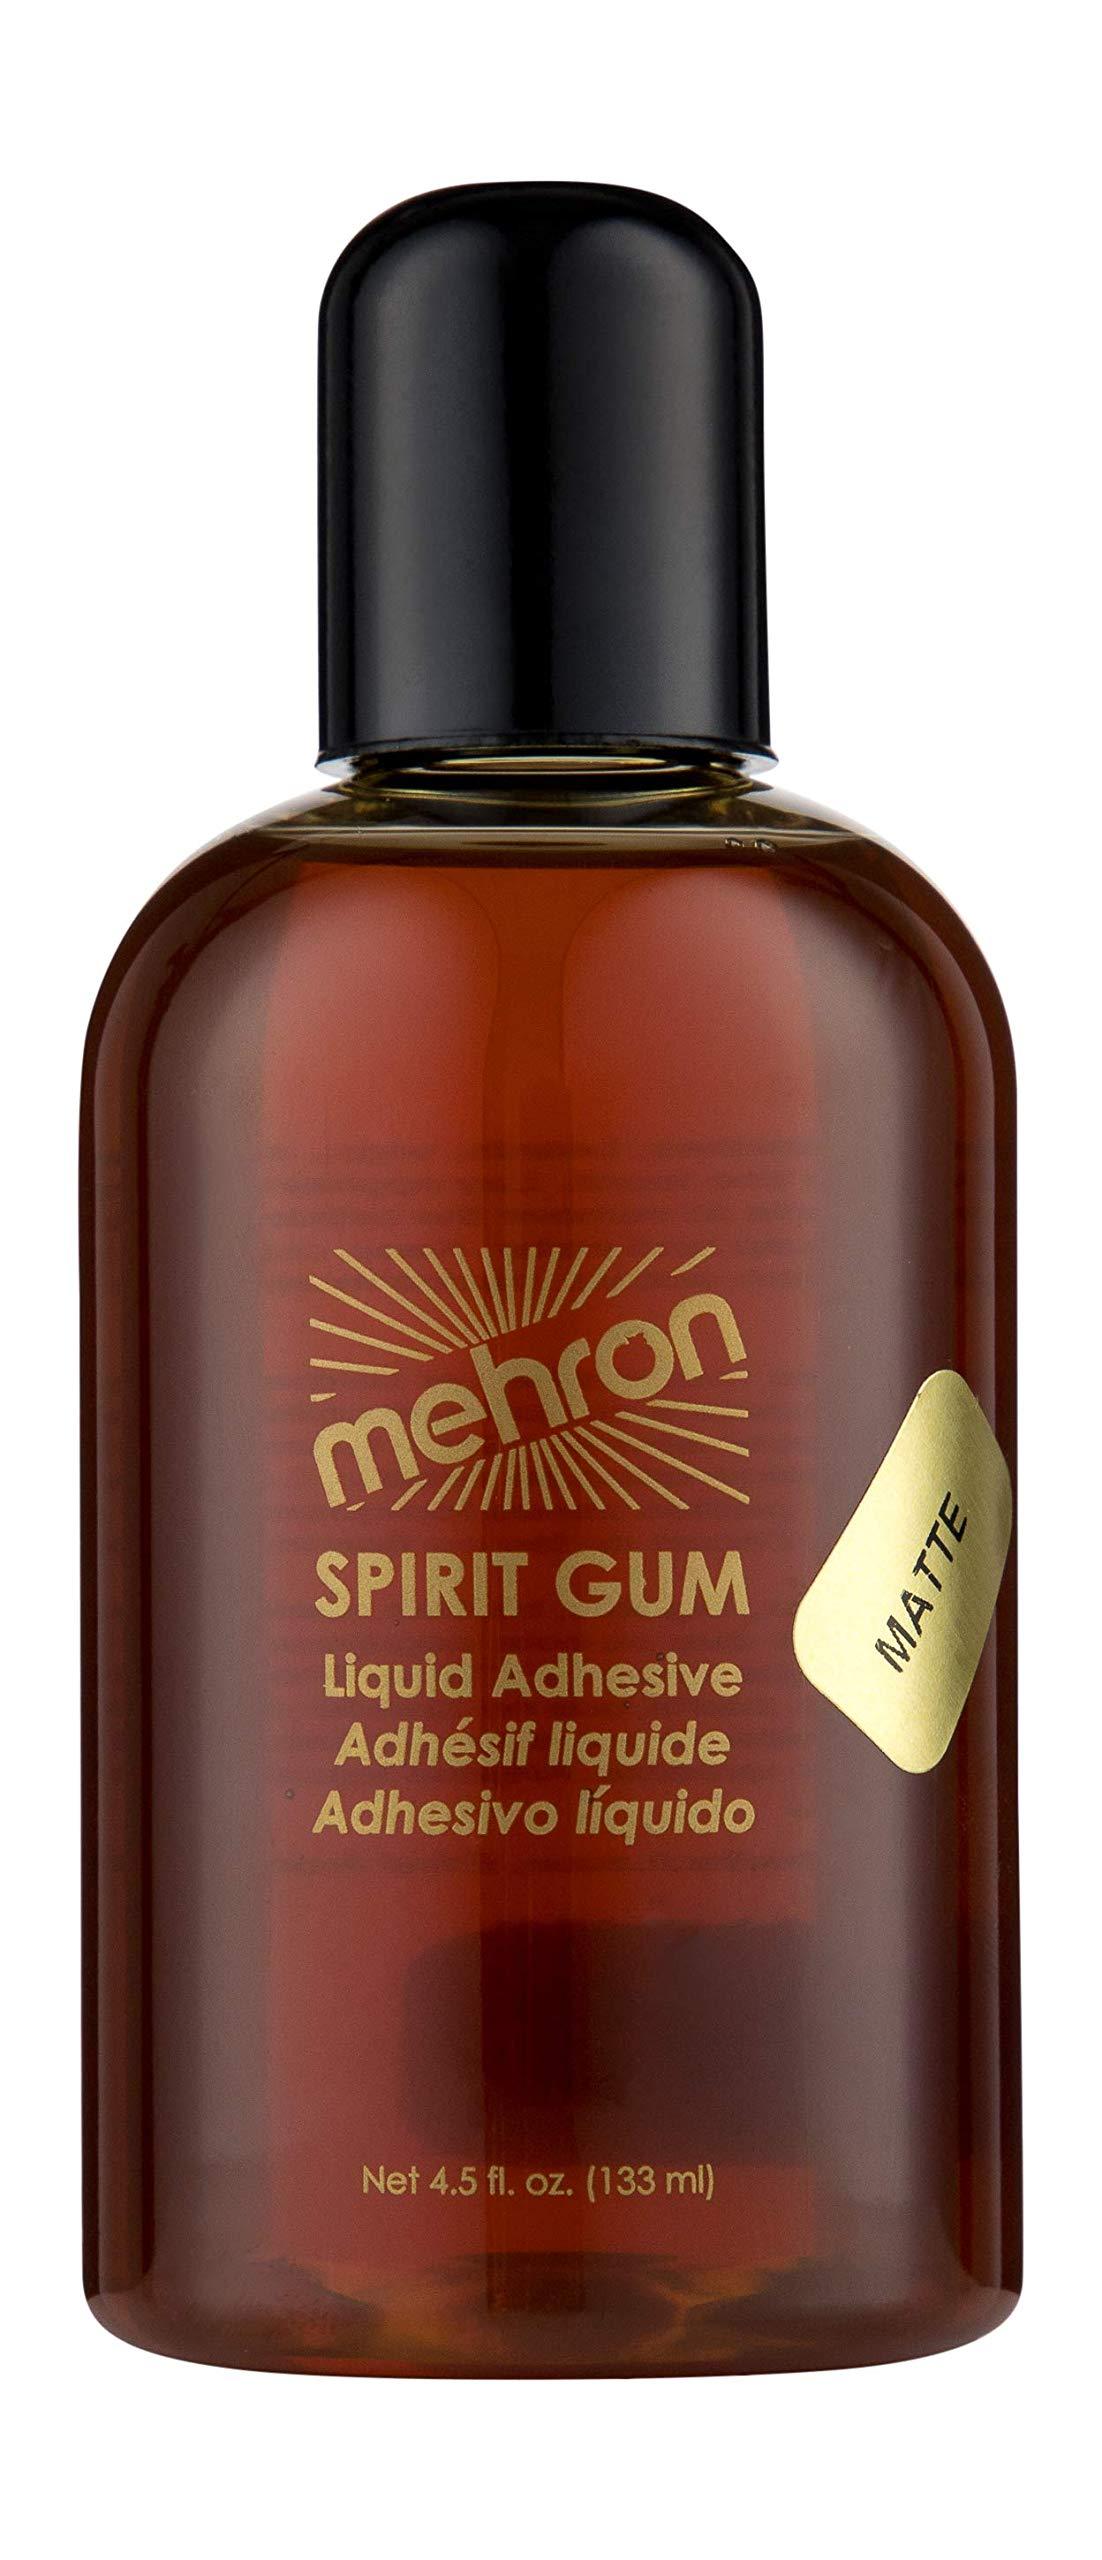 Mehron Makeup Spirit Gum (4.5 oz) (Matte) by Mehron